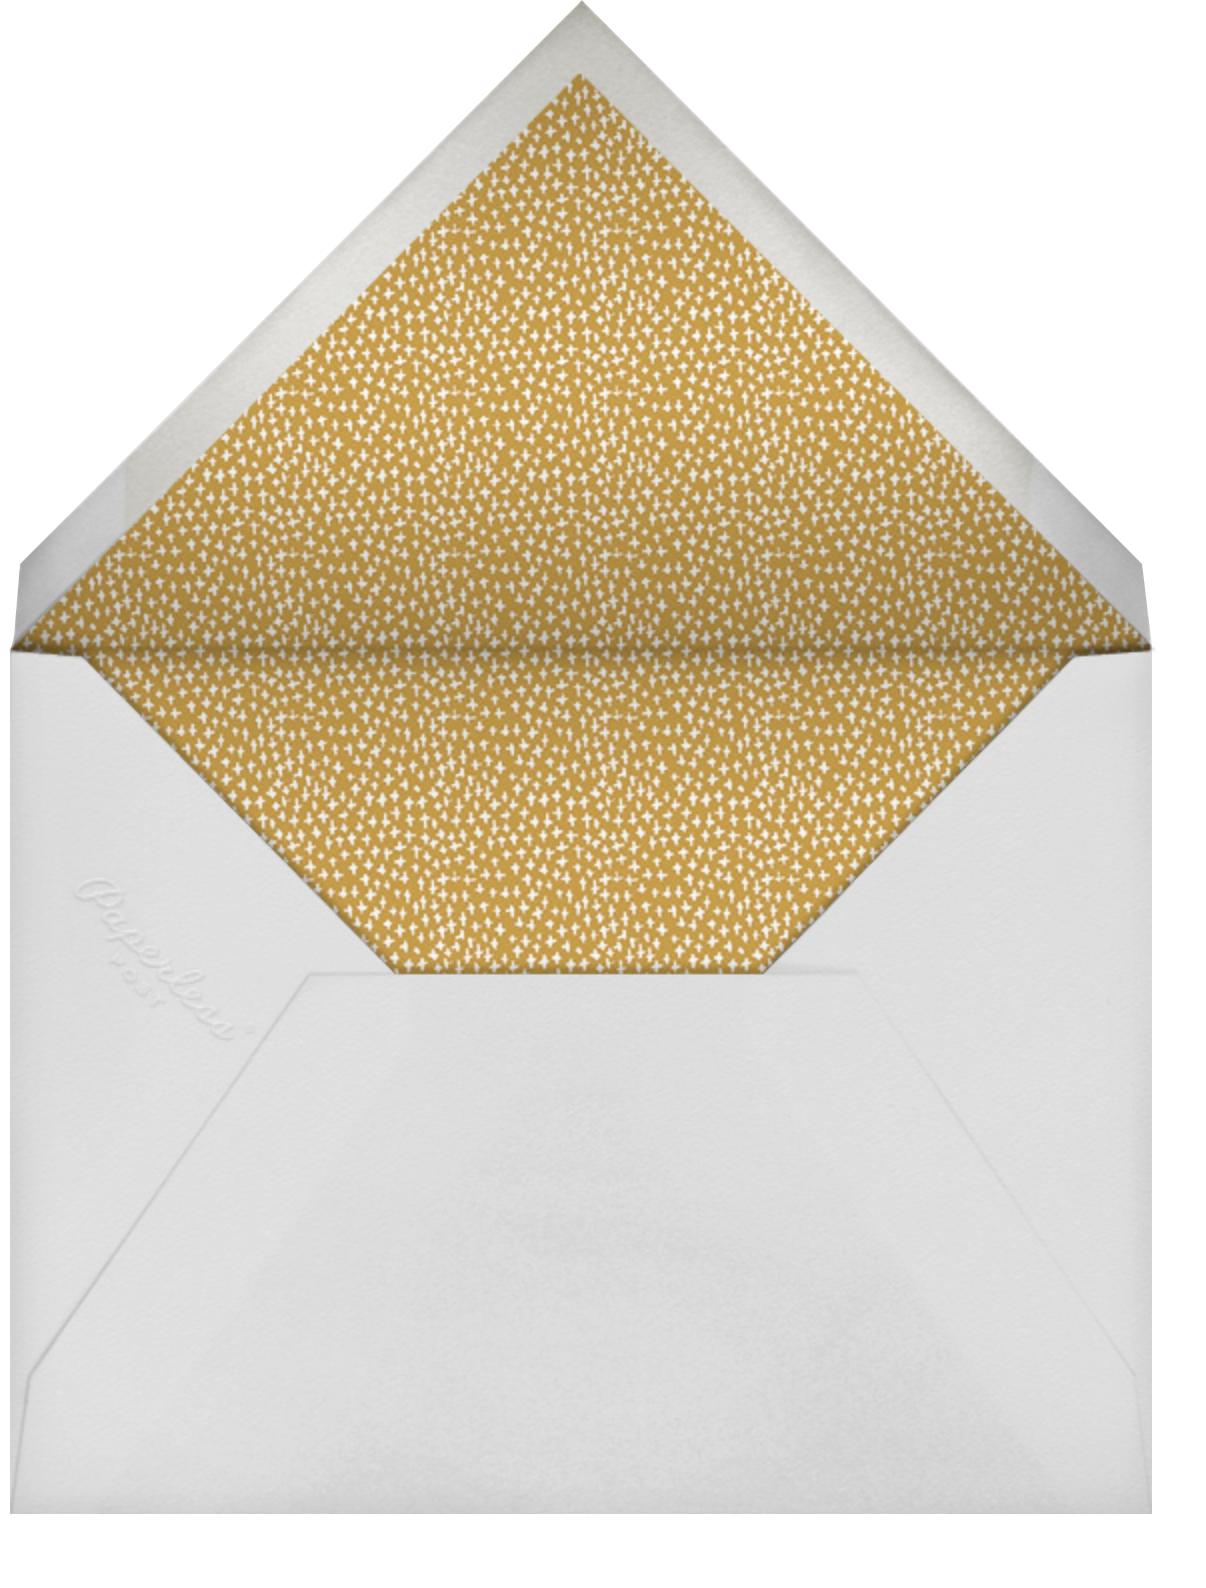 Among the Daisies - Amazon - Mr. Boddington's Studio - Adult birthday - envelope back